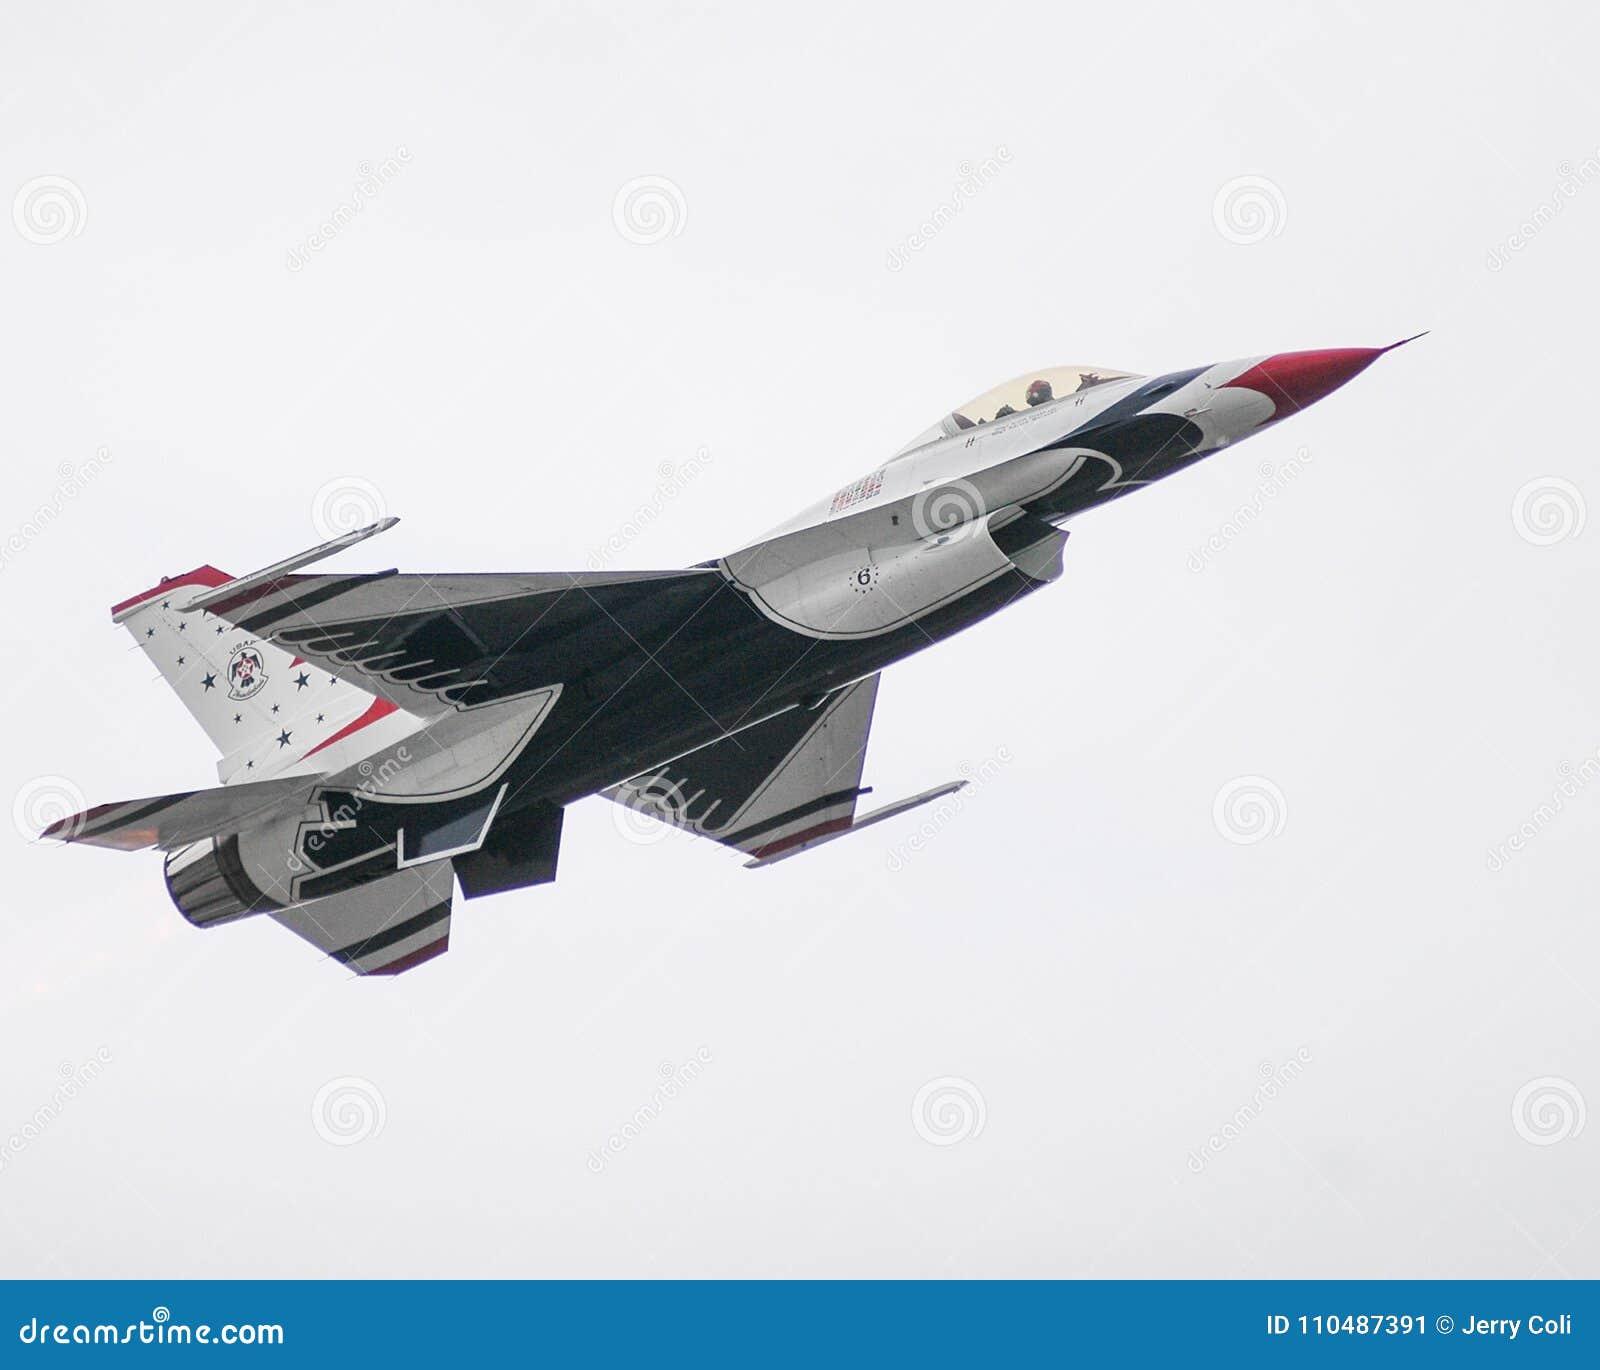 USAF Thunderbird taking off